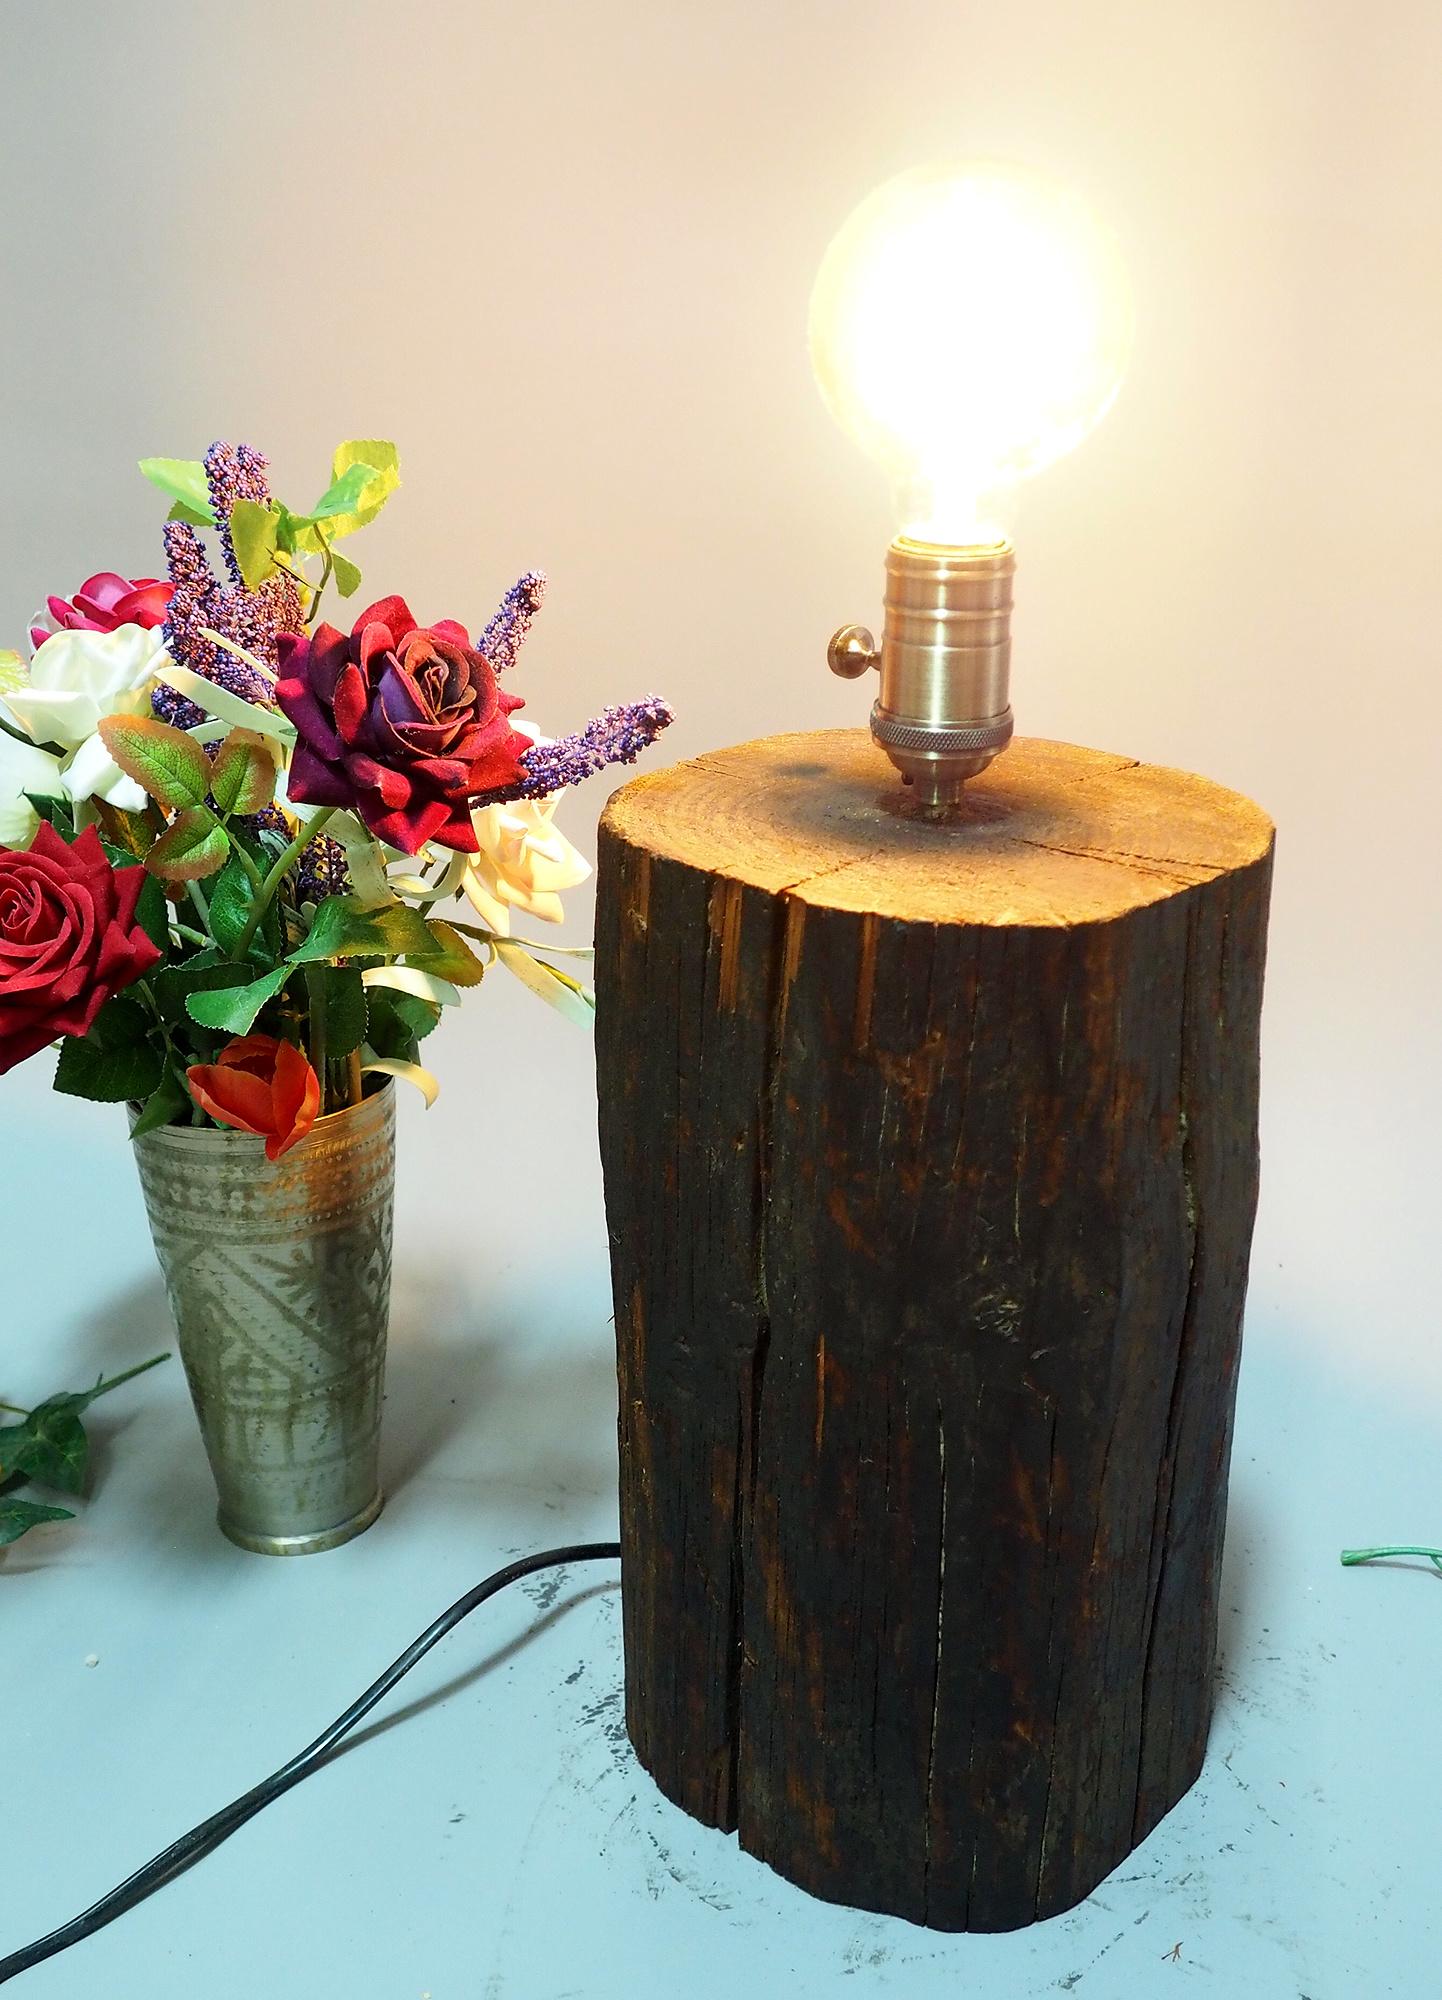 islamische antike orient massiv Holz Lampenfuß Lampensockel aus Nuristan Afghanistan Swat-tall pakistan NU5